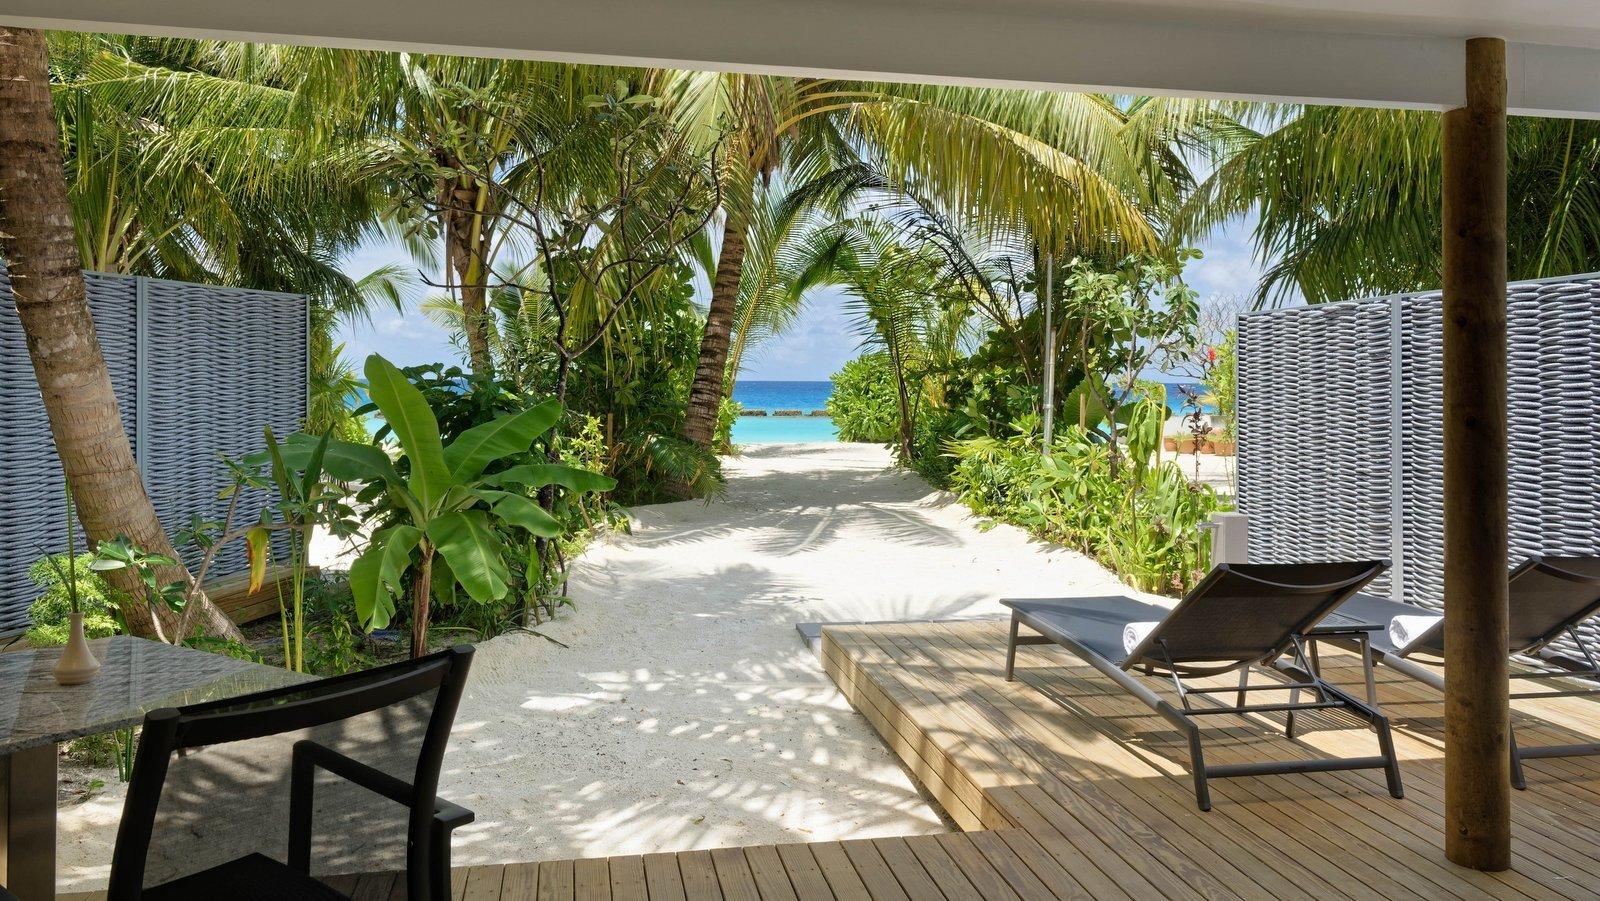 Мальдивы, отель LTI Maafushivaru Maldives, номер Beach Villa